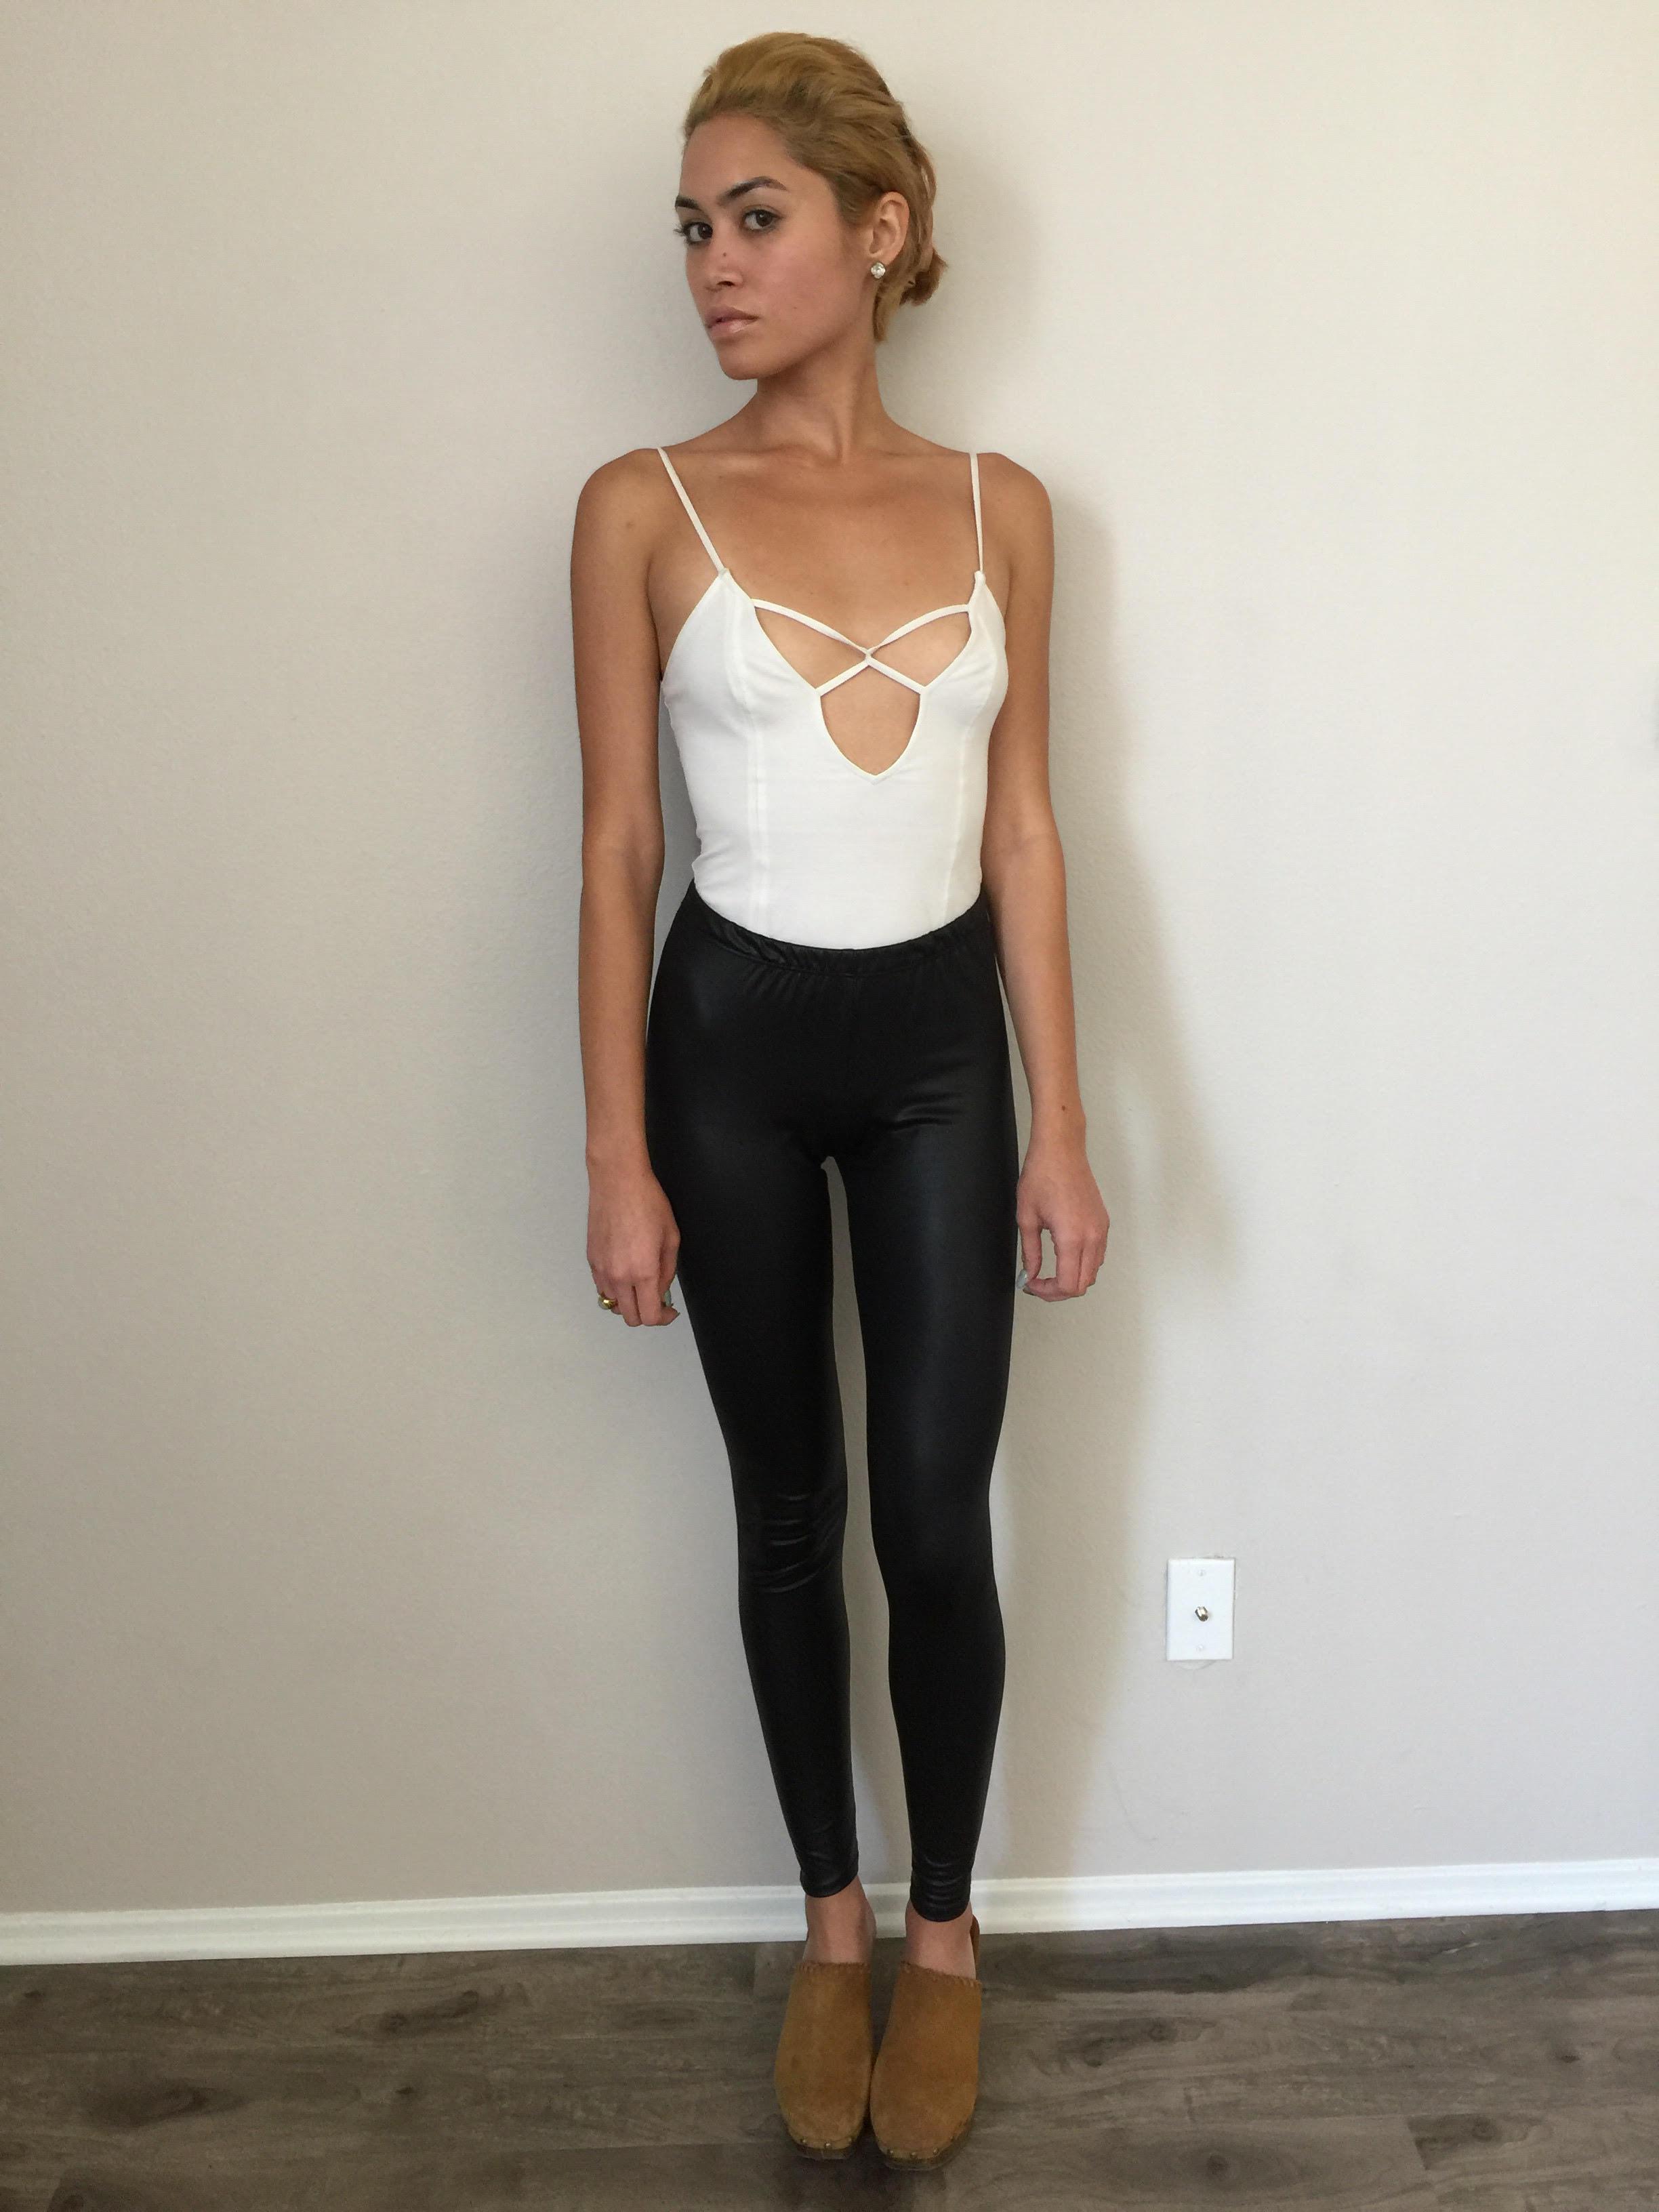 Rebecca L'Amore - Full Body Front.jpg